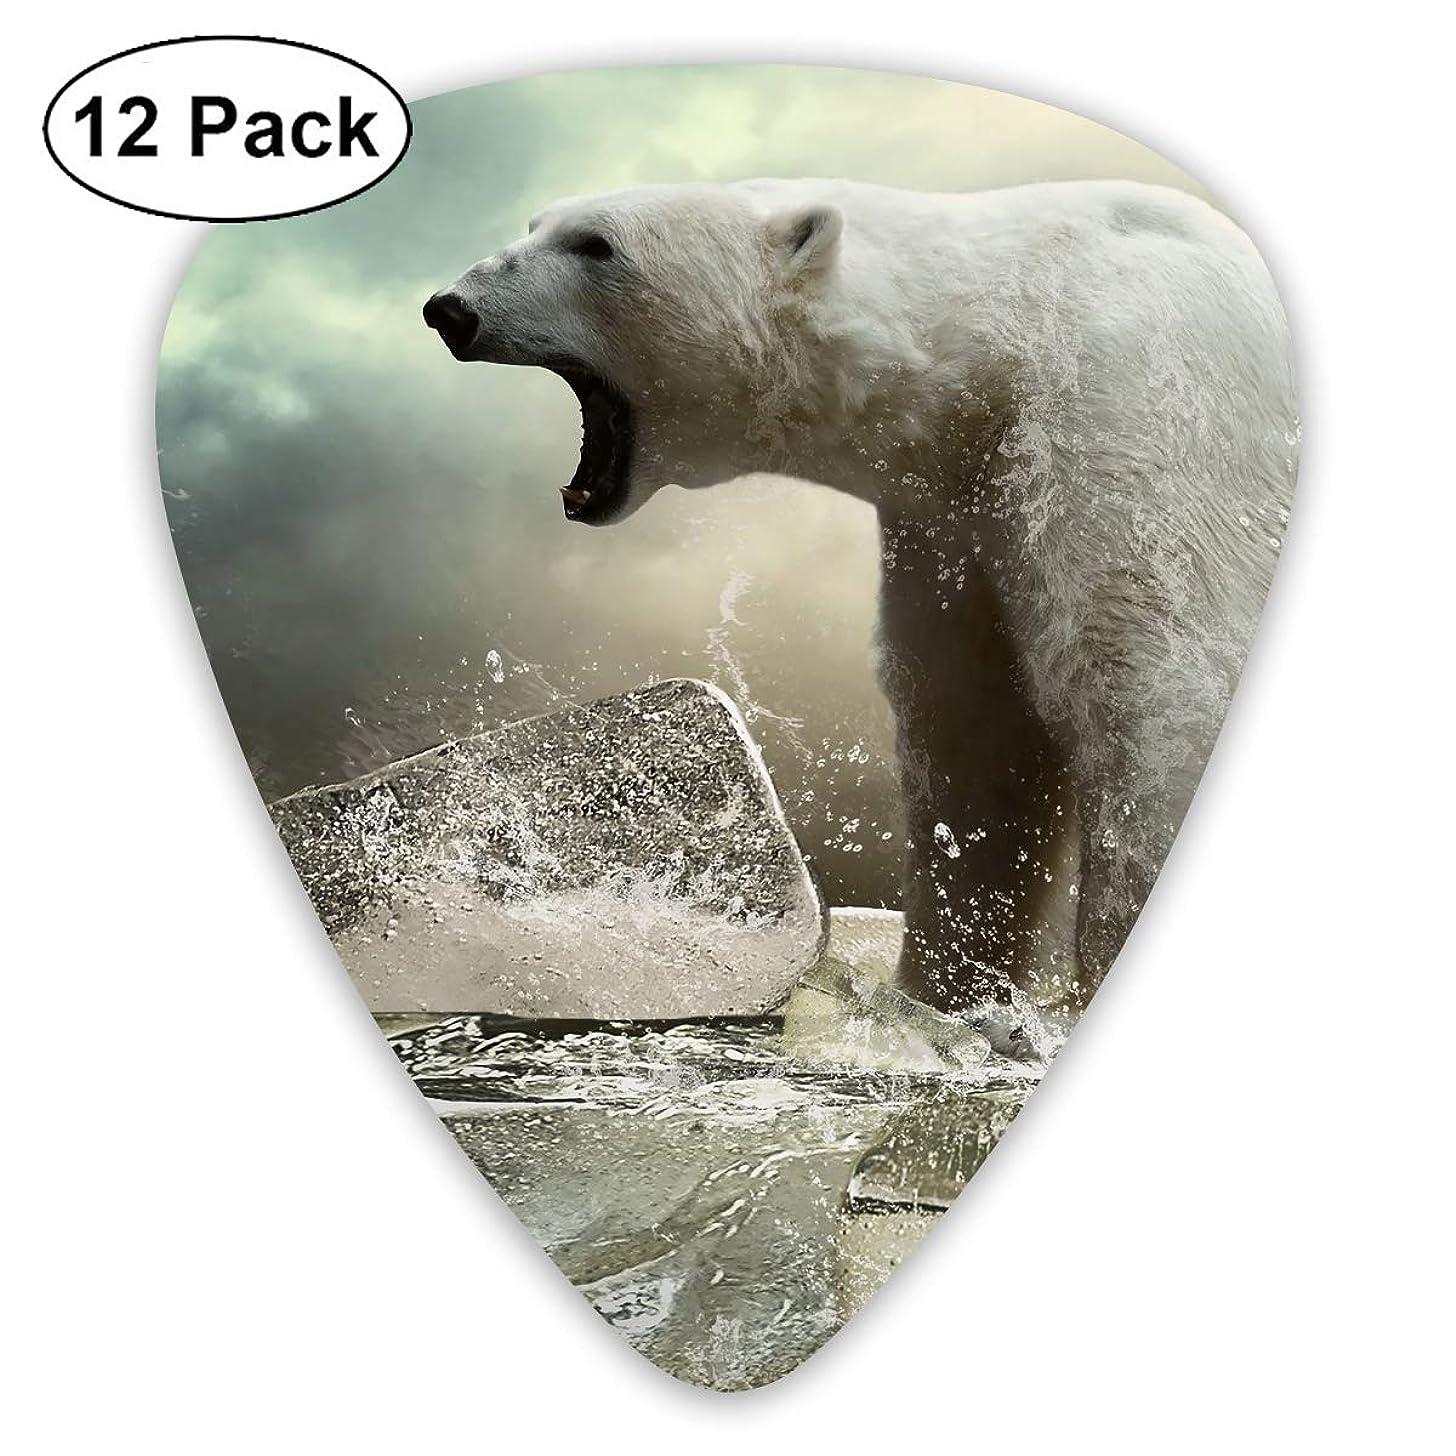 V5DGFJH.B Polar Bear On Ice Classic Guitar Pick Player's Pack for Electric Guitar,Acoustic Guitar,Mandolin,Guitar Bass